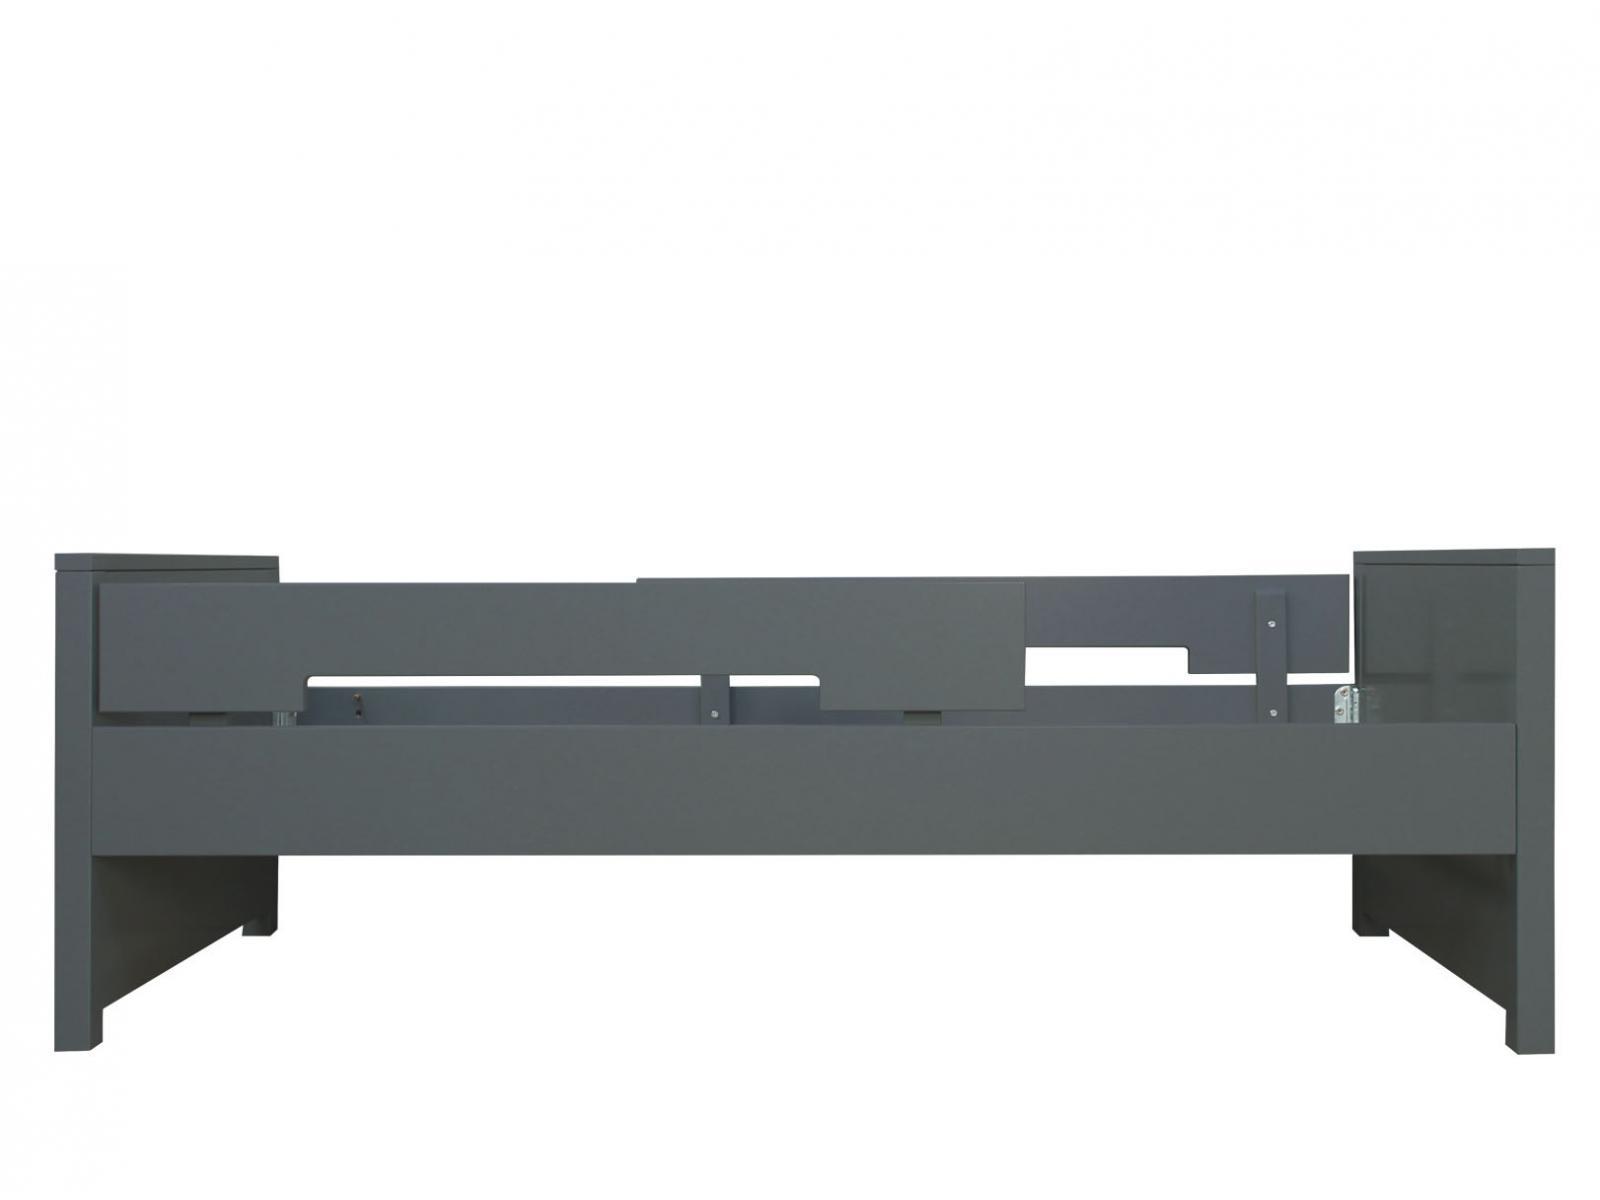 bopita lit 90x200 jonne gris profond incl 2 barres de protection. Black Bedroom Furniture Sets. Home Design Ideas